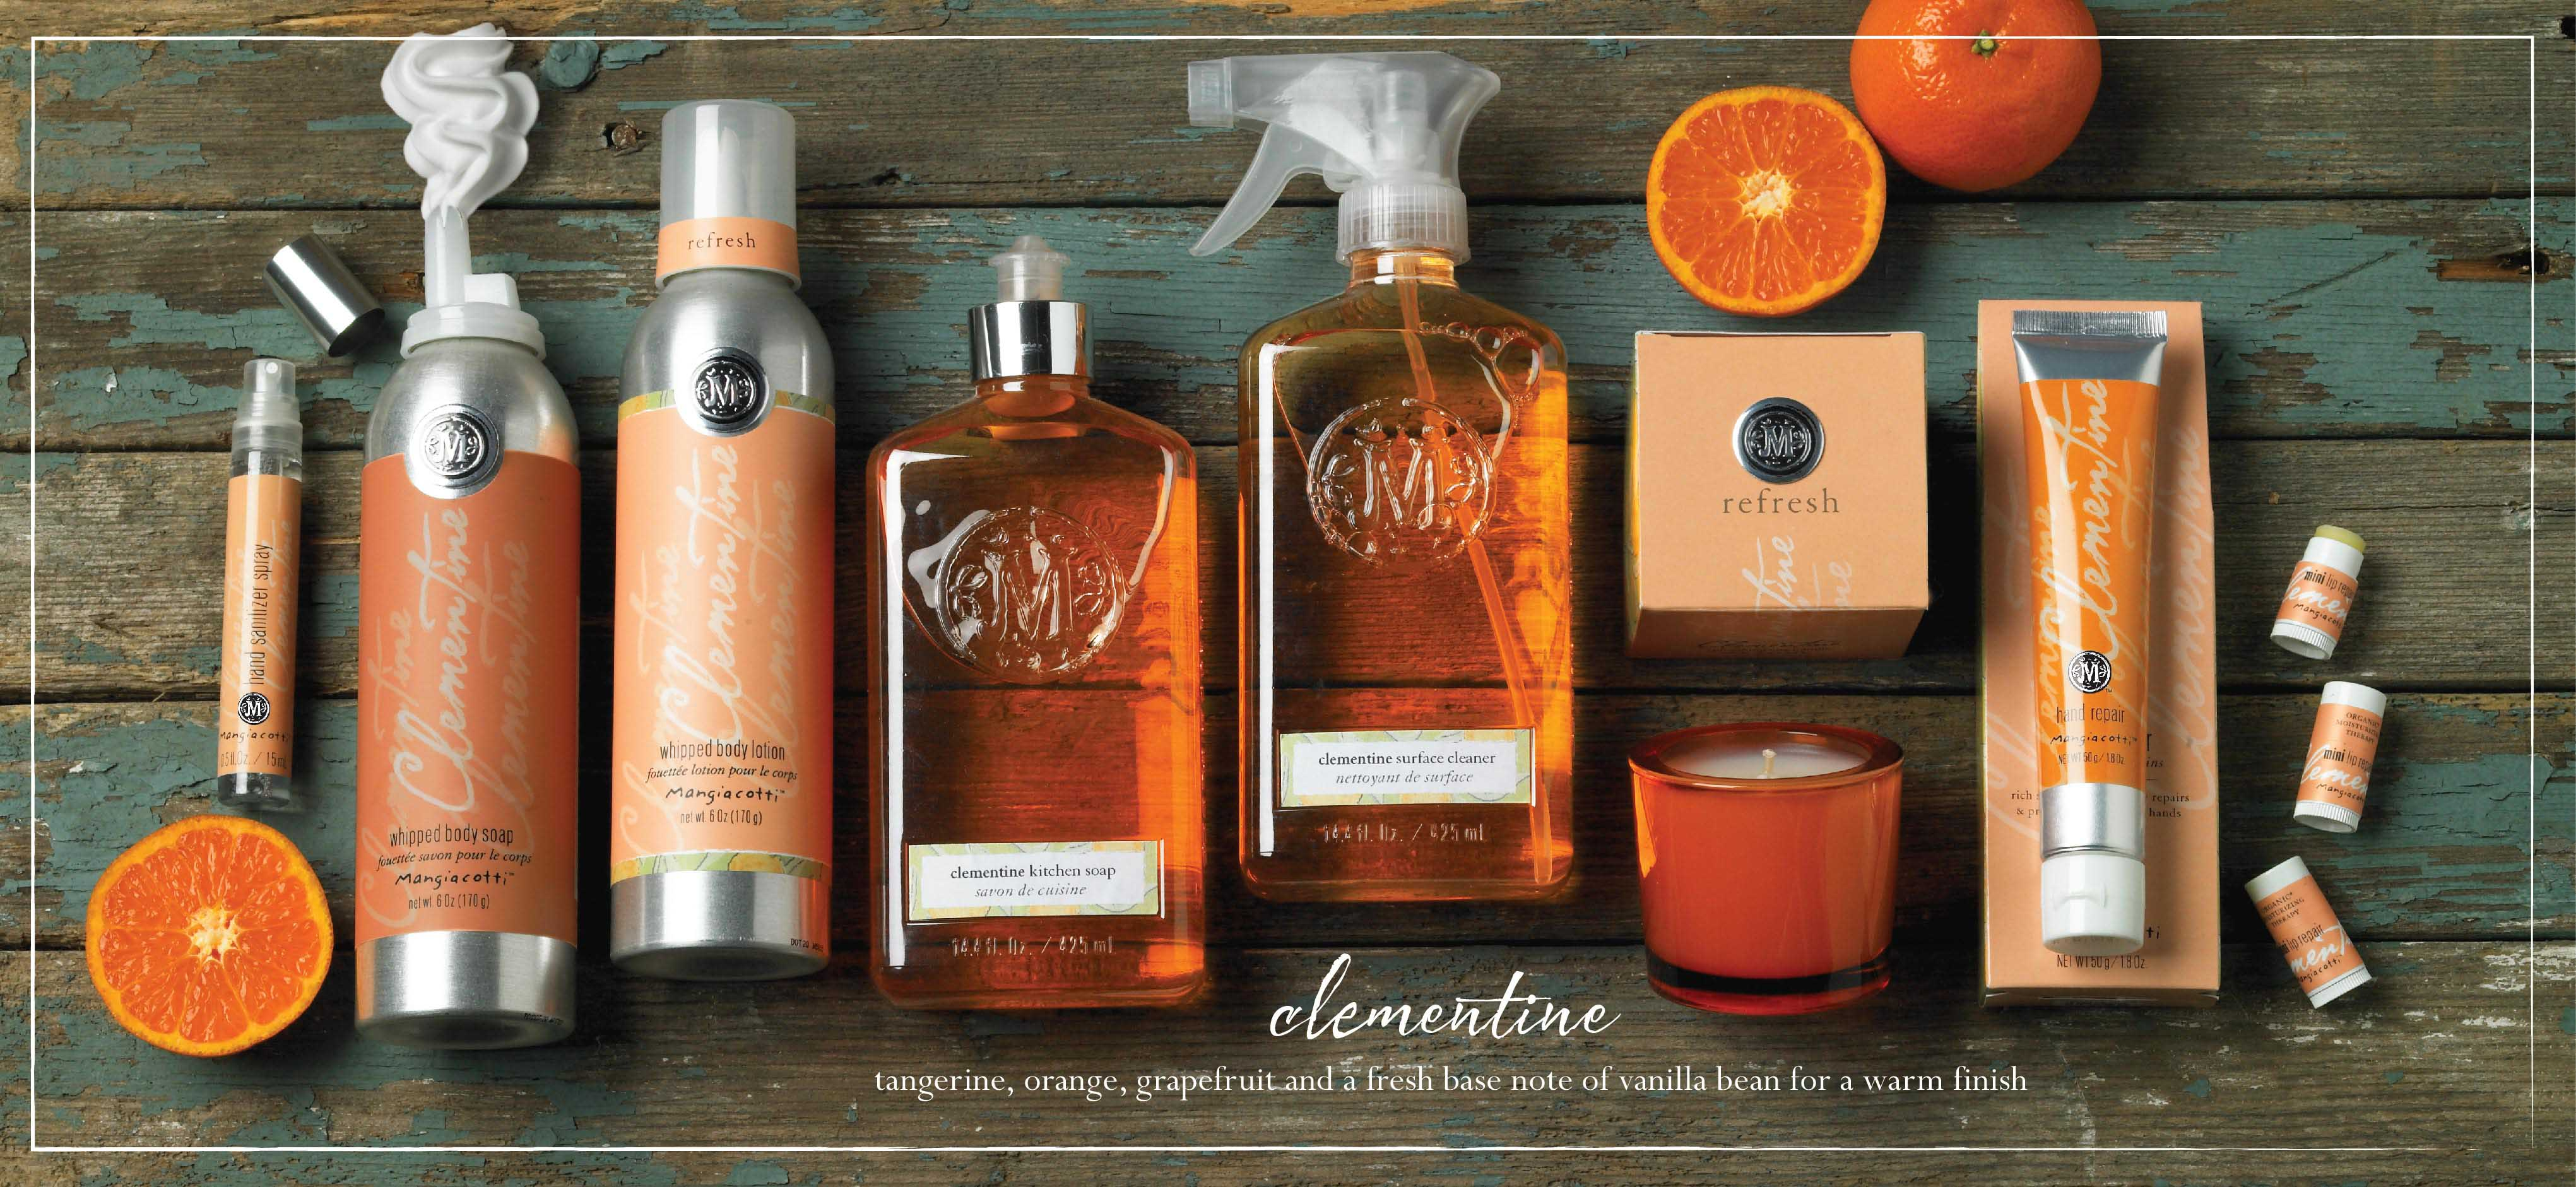 clementine-web-fragrance.jpg